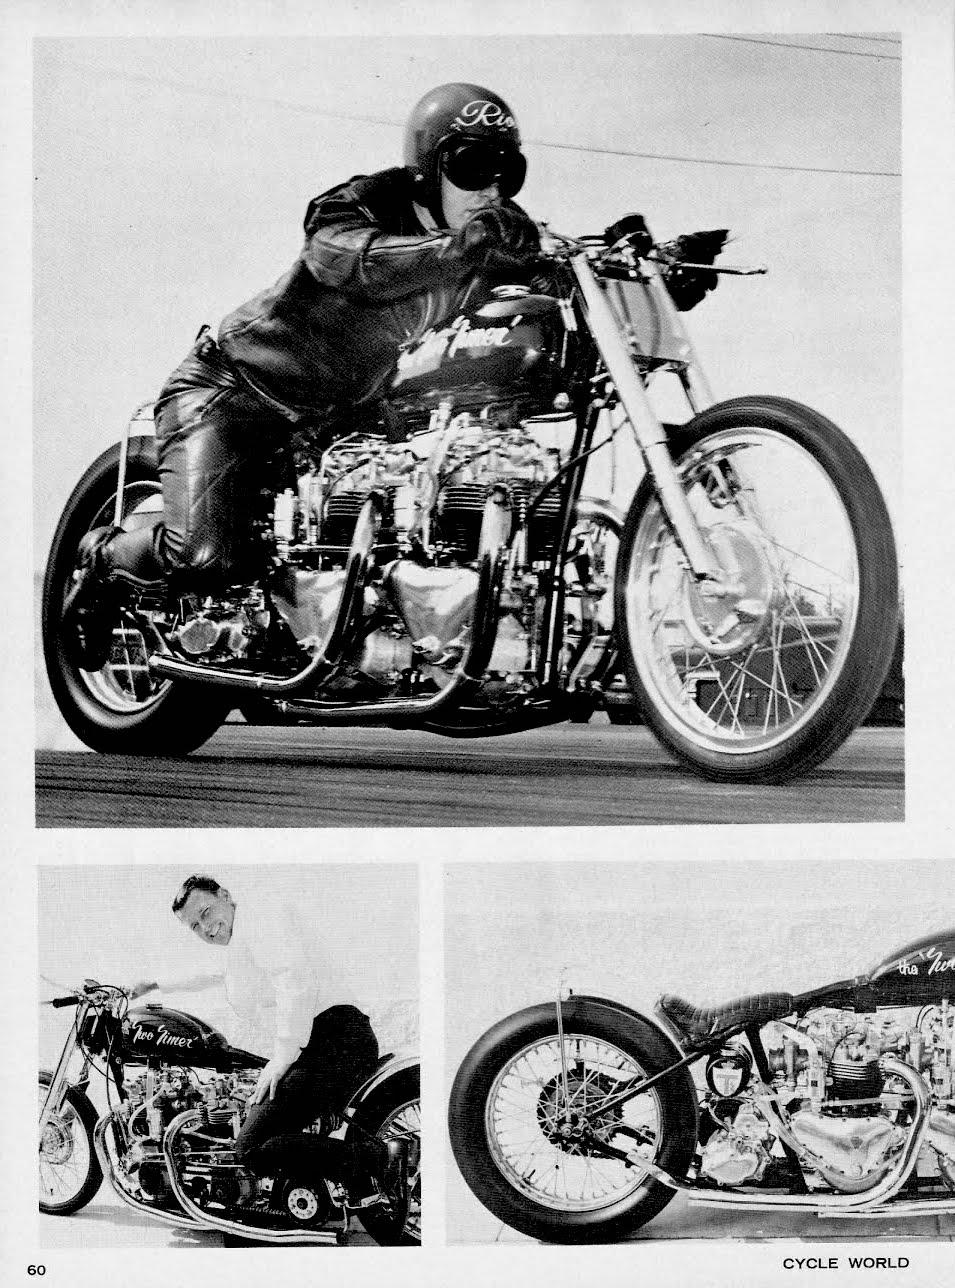 1964azzz1965 dick rios two timer triumph motorcycle drag bike